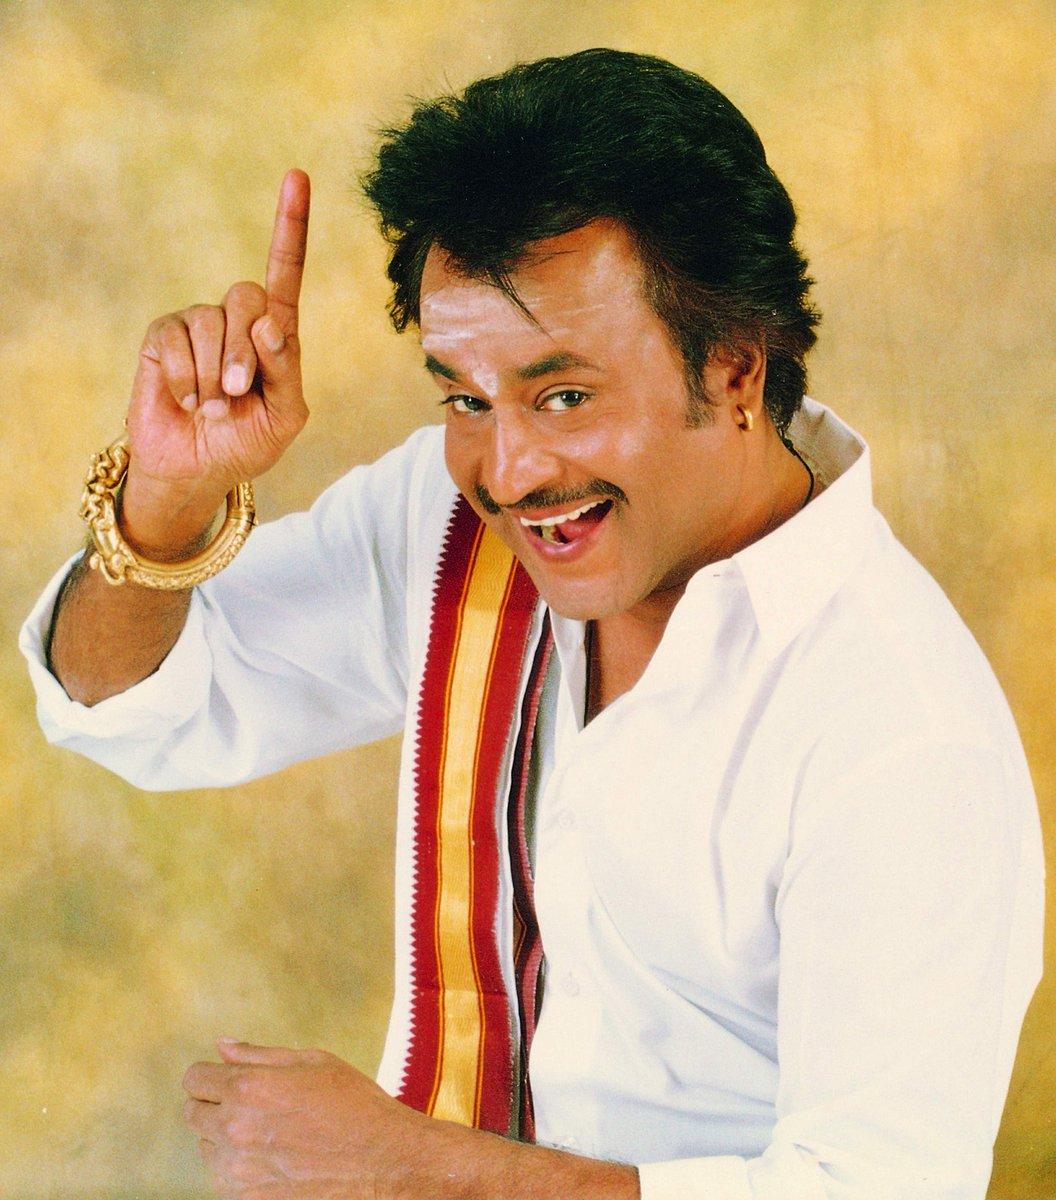 rajini sivaramrajini murugan, rajini sivaram, rajini movies, rajini island, rajini songs, rajini songs tamil, rajini movie collection, rajini and mammootty song, rajini pollathavan movie song, rajini murugan songs download, rajini and revathi movie, rajini murugan movie, rajini movie list, rajini full movie, rajini murugan songs lyrics, ghajini actress wiki, rajini murugan box office, rajini murugan songs, rajini pongal celebration